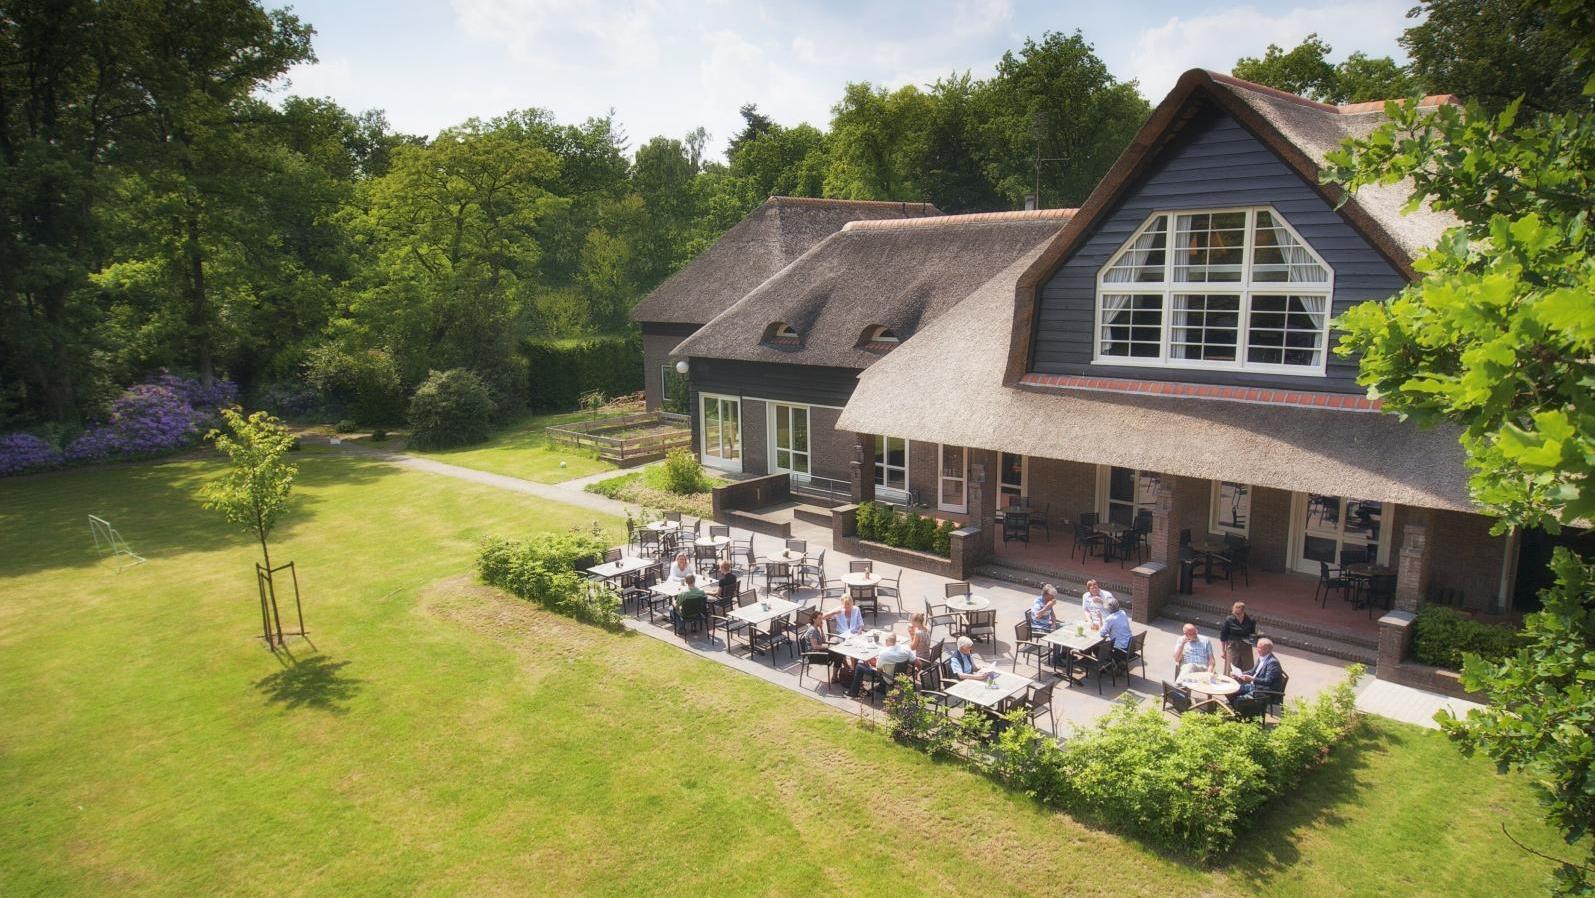 hotelsterren-landgoedhotel-woodbrooke